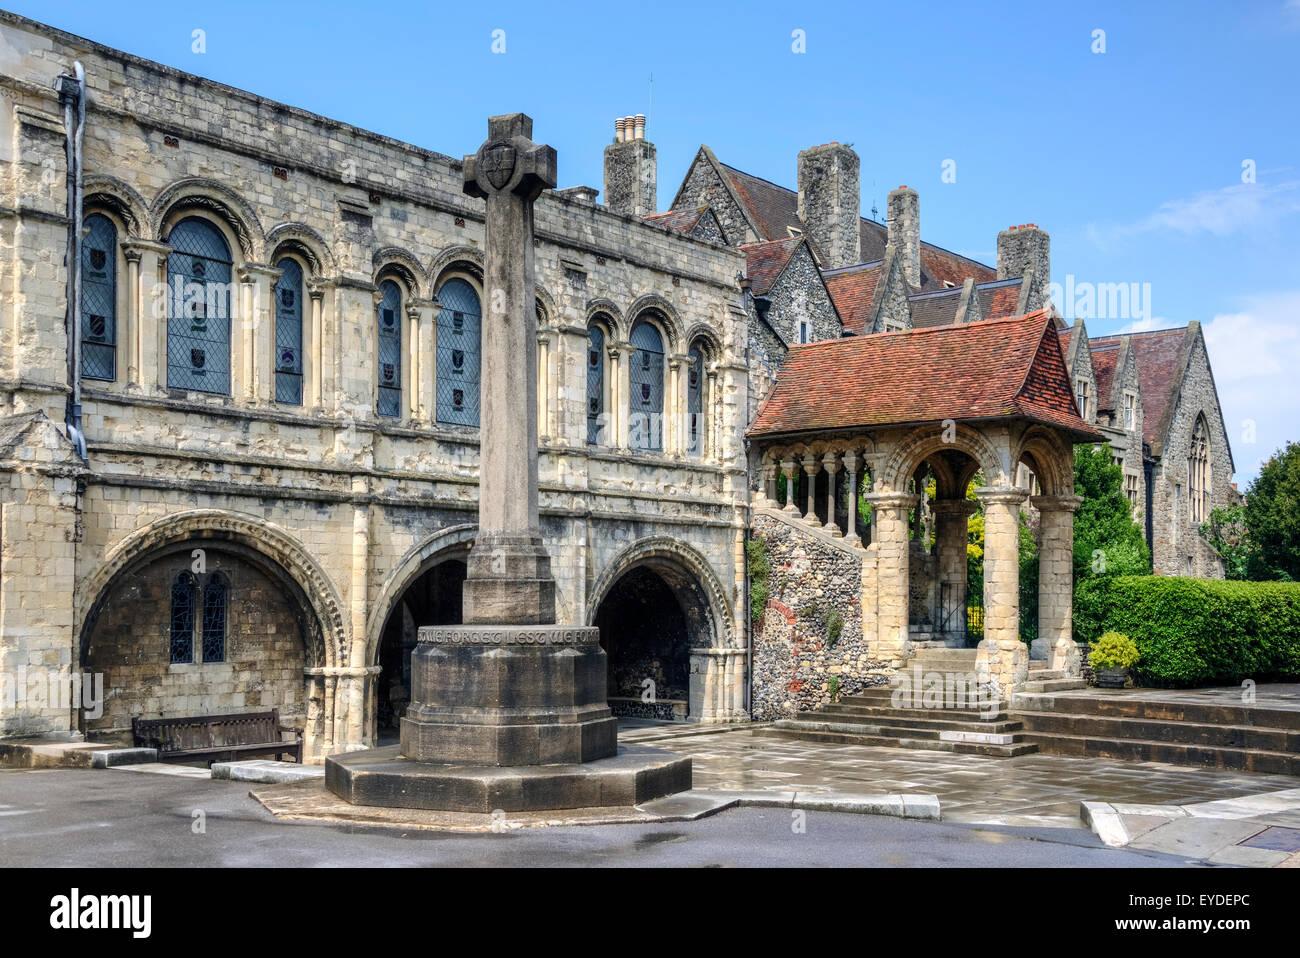 Norman staircase, King's School, Canterbury, Kent, England, United Kingdom - Stock Image